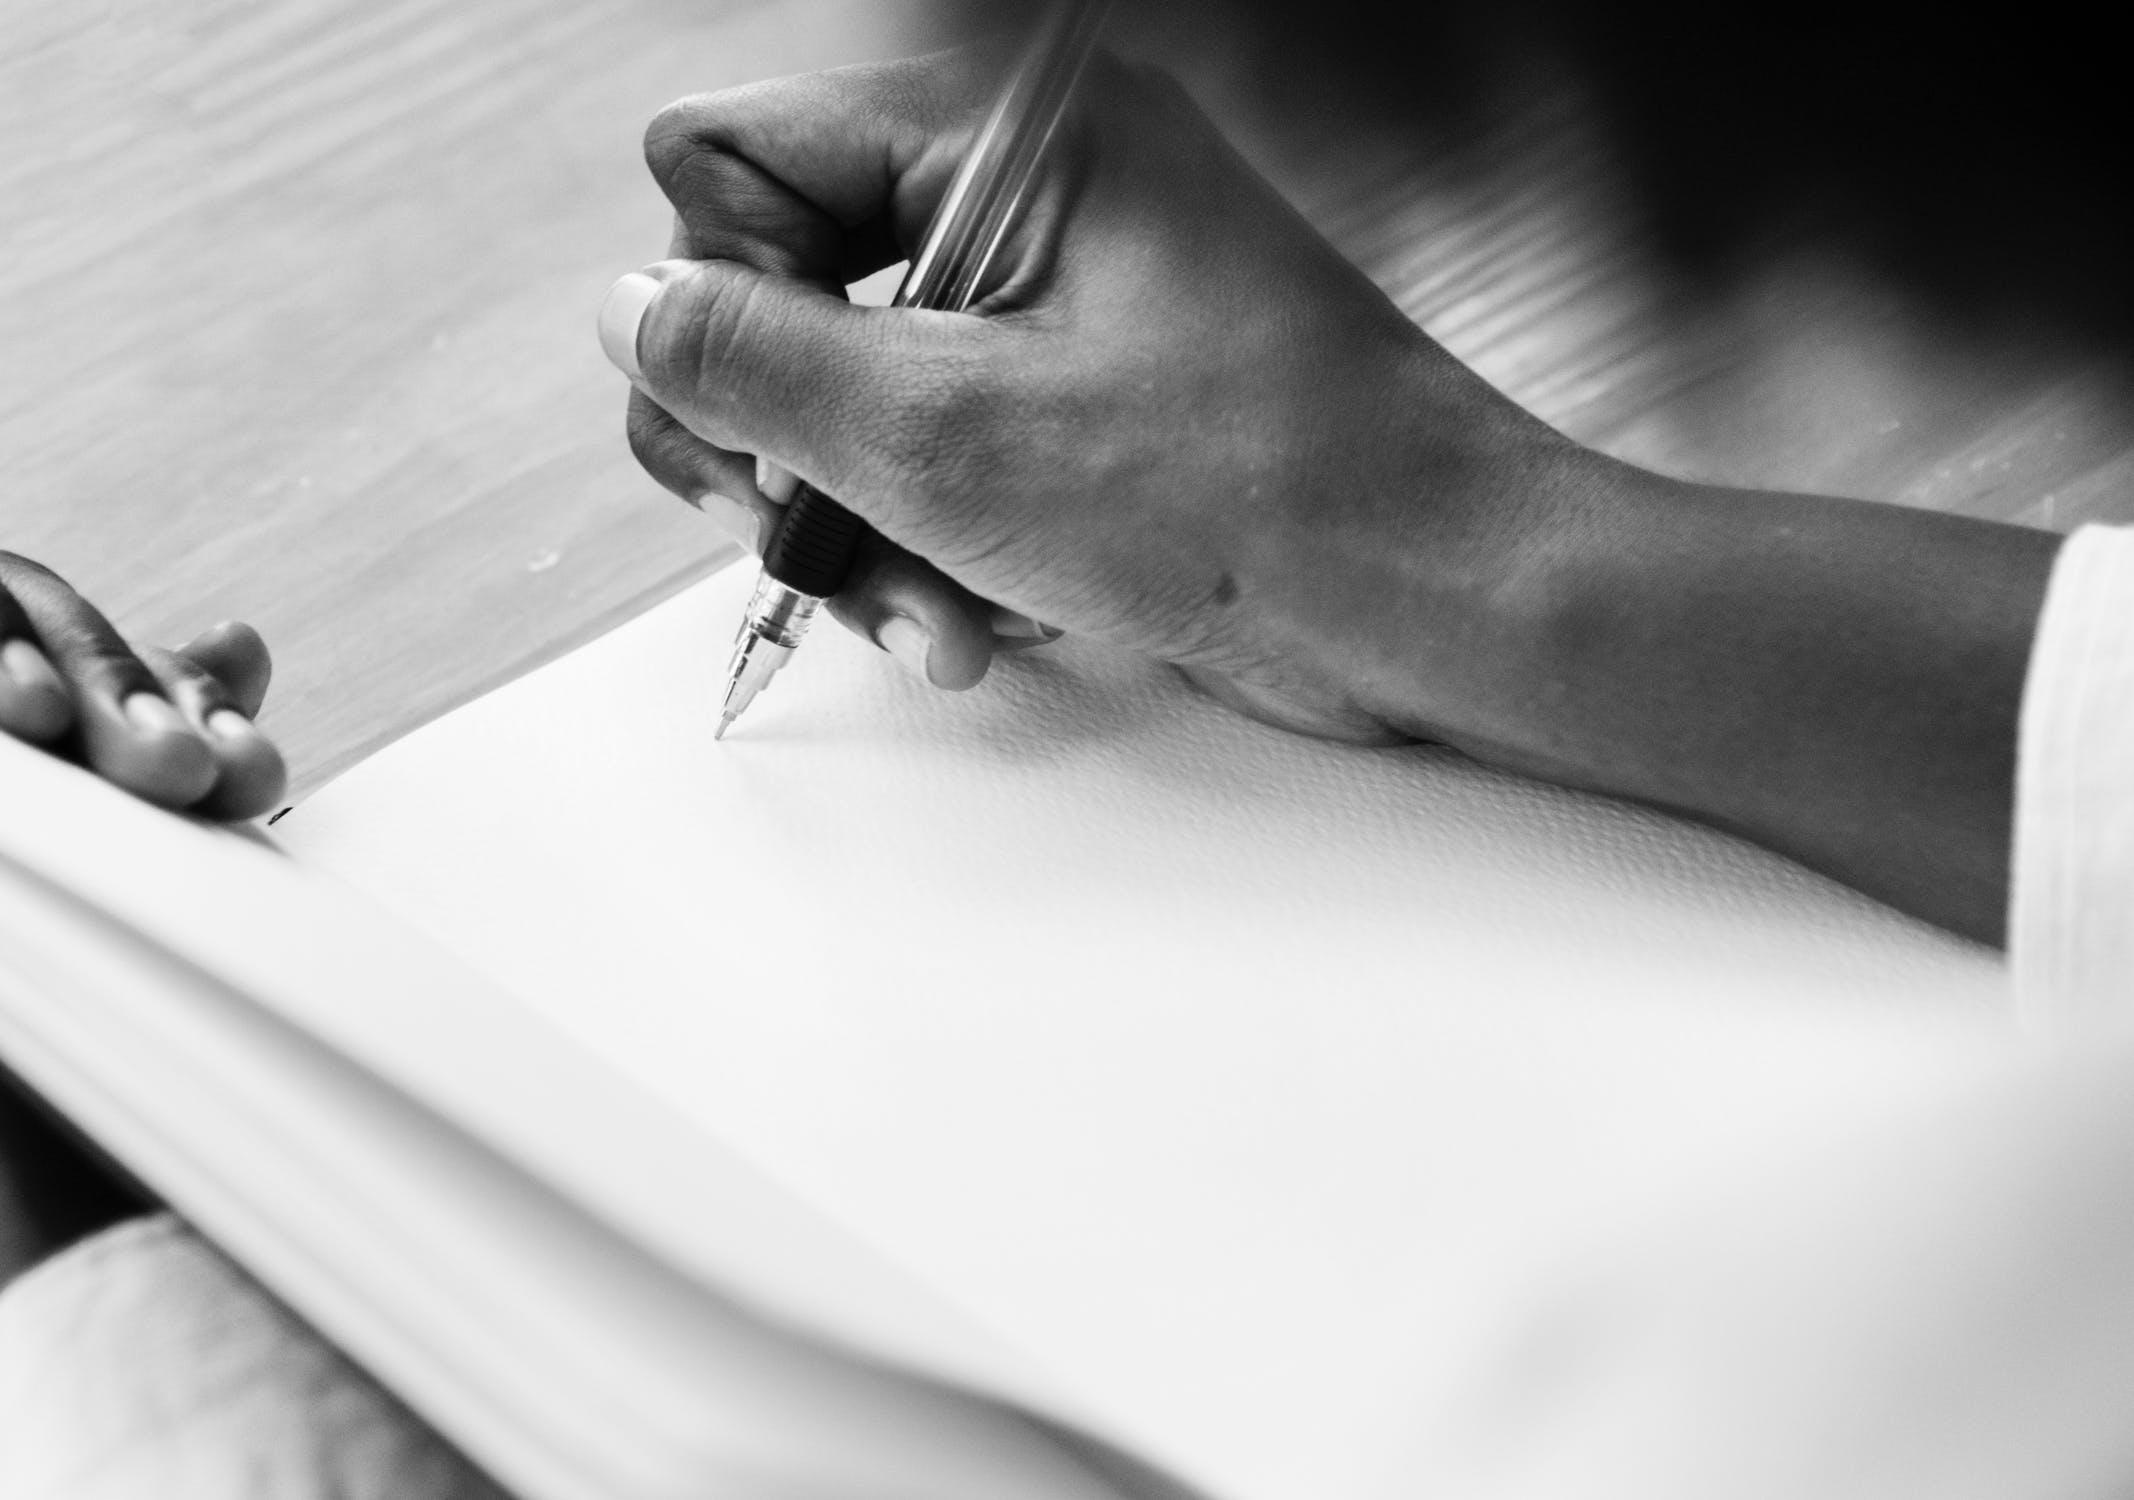 Woman writes in blank notebook